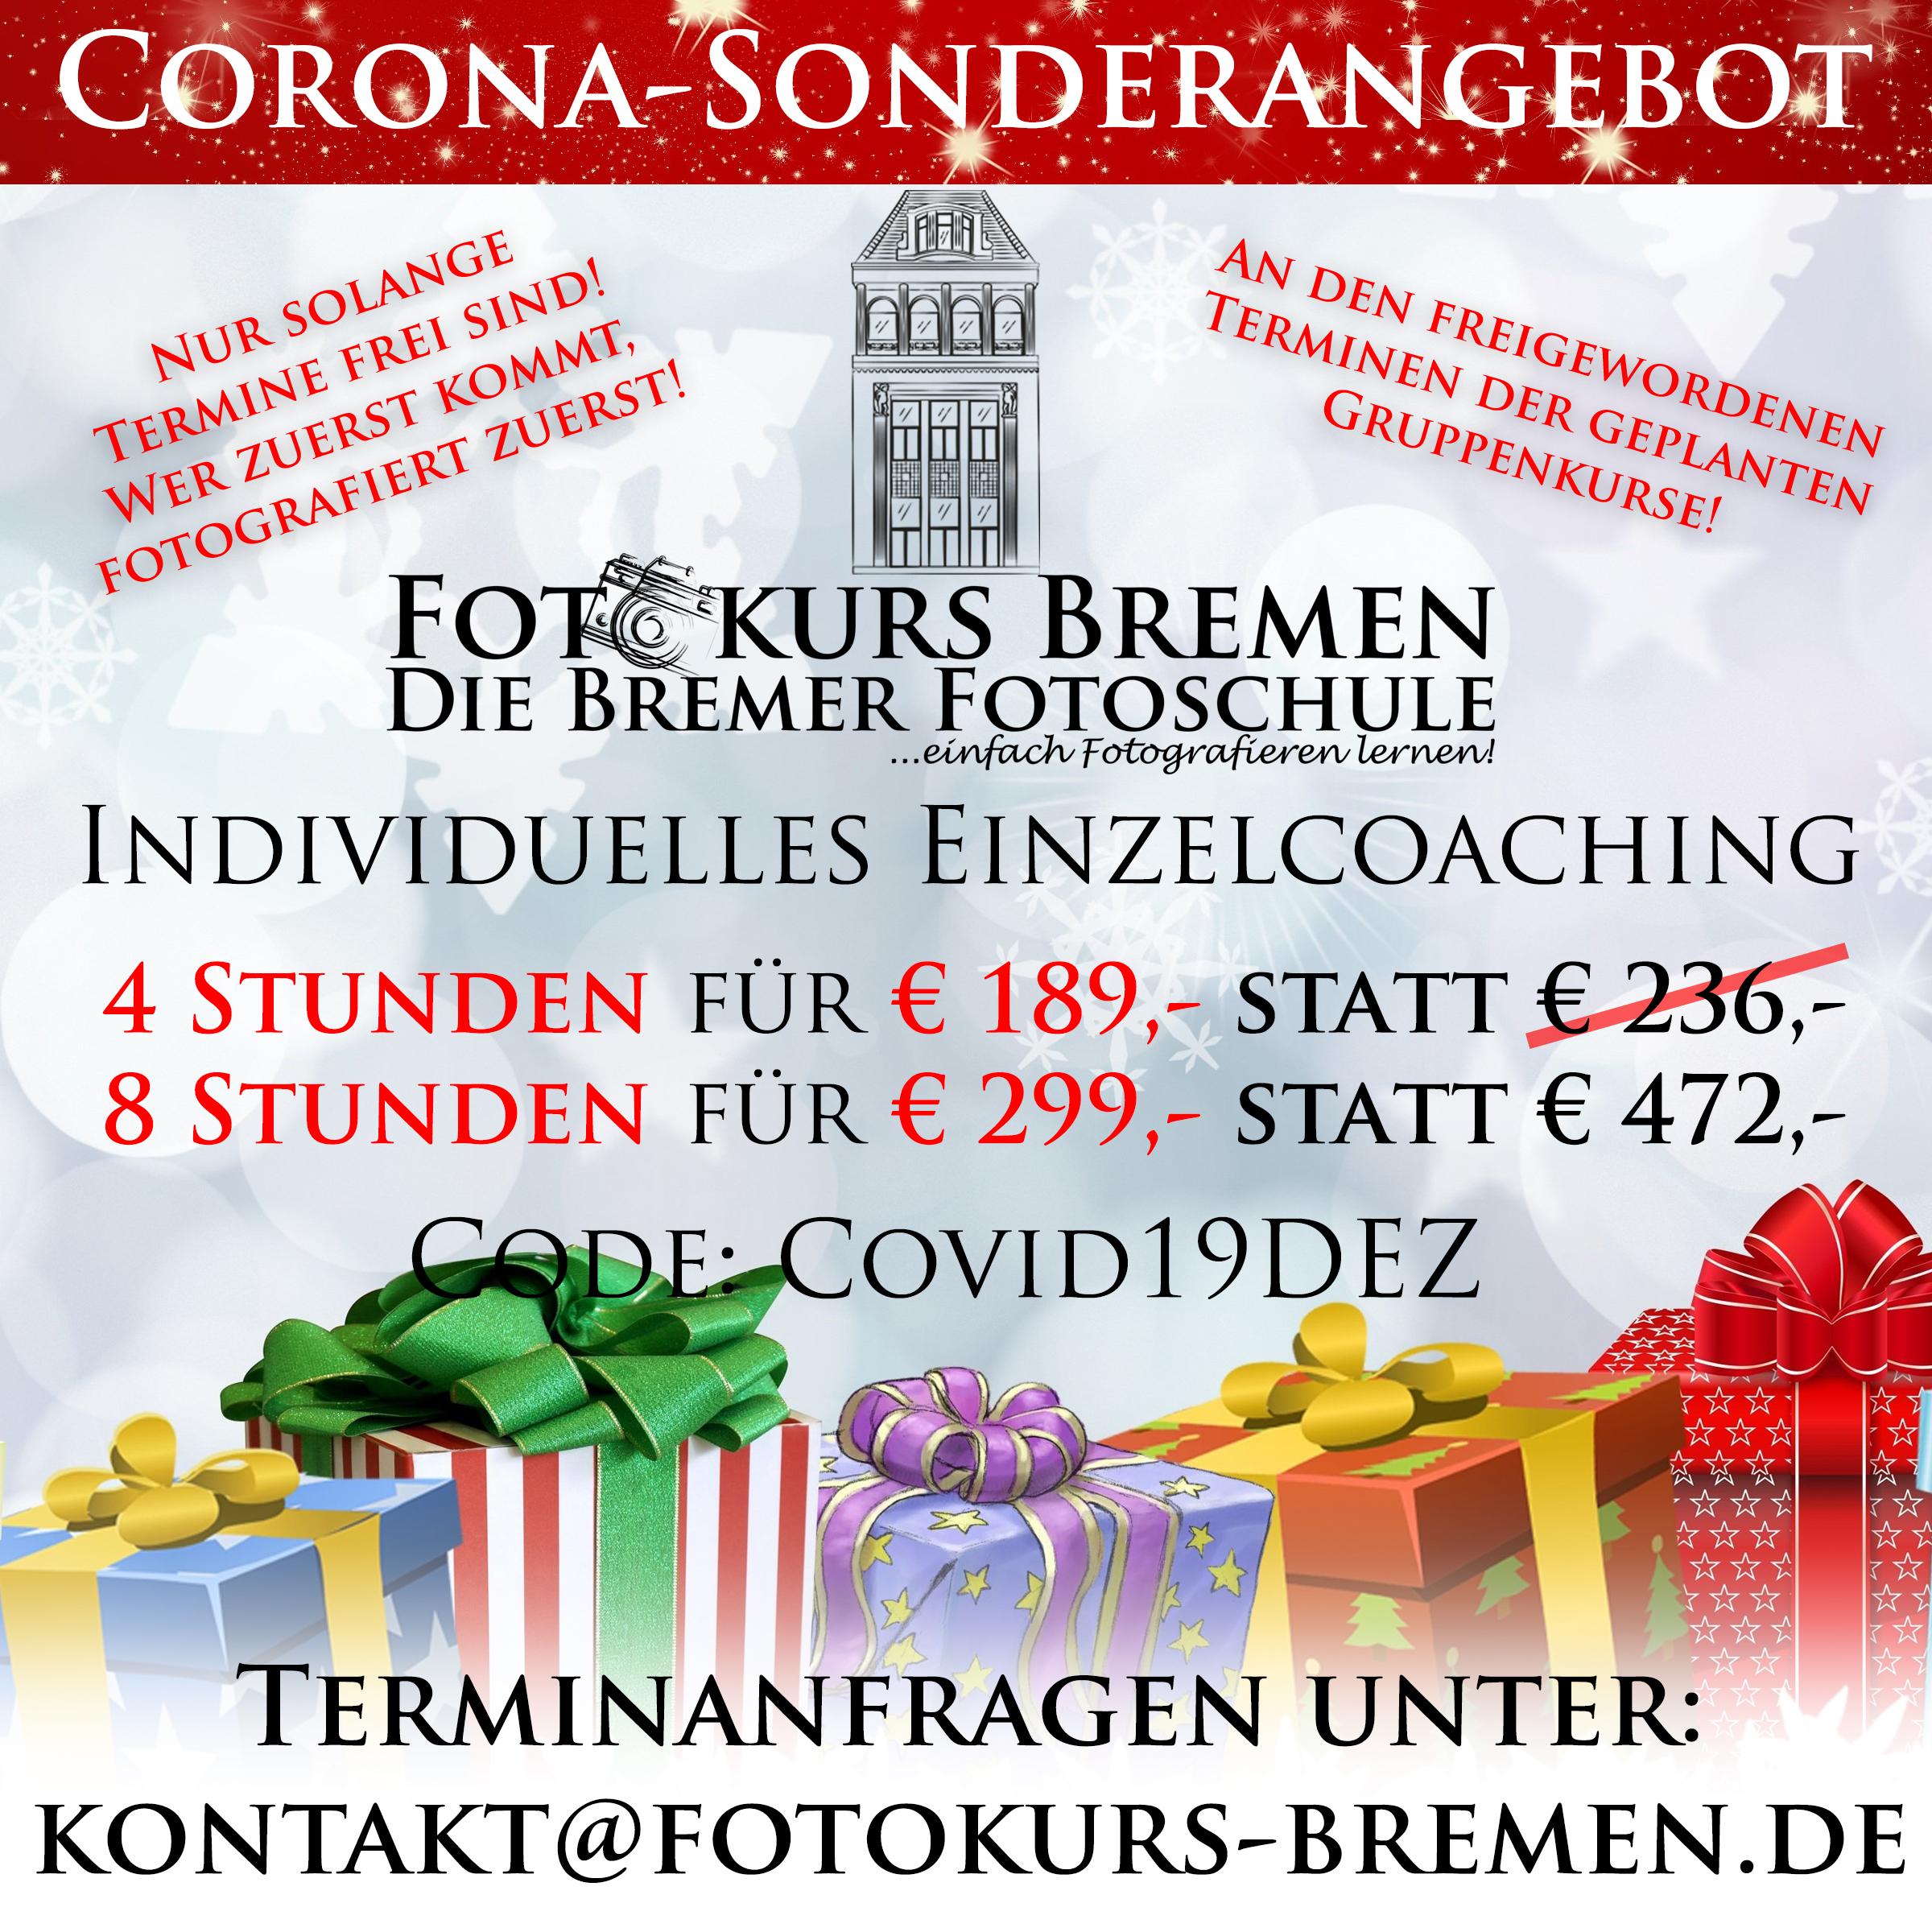 Fotokurs, Bremen, Aktion, Dezember, Corona, Angebot